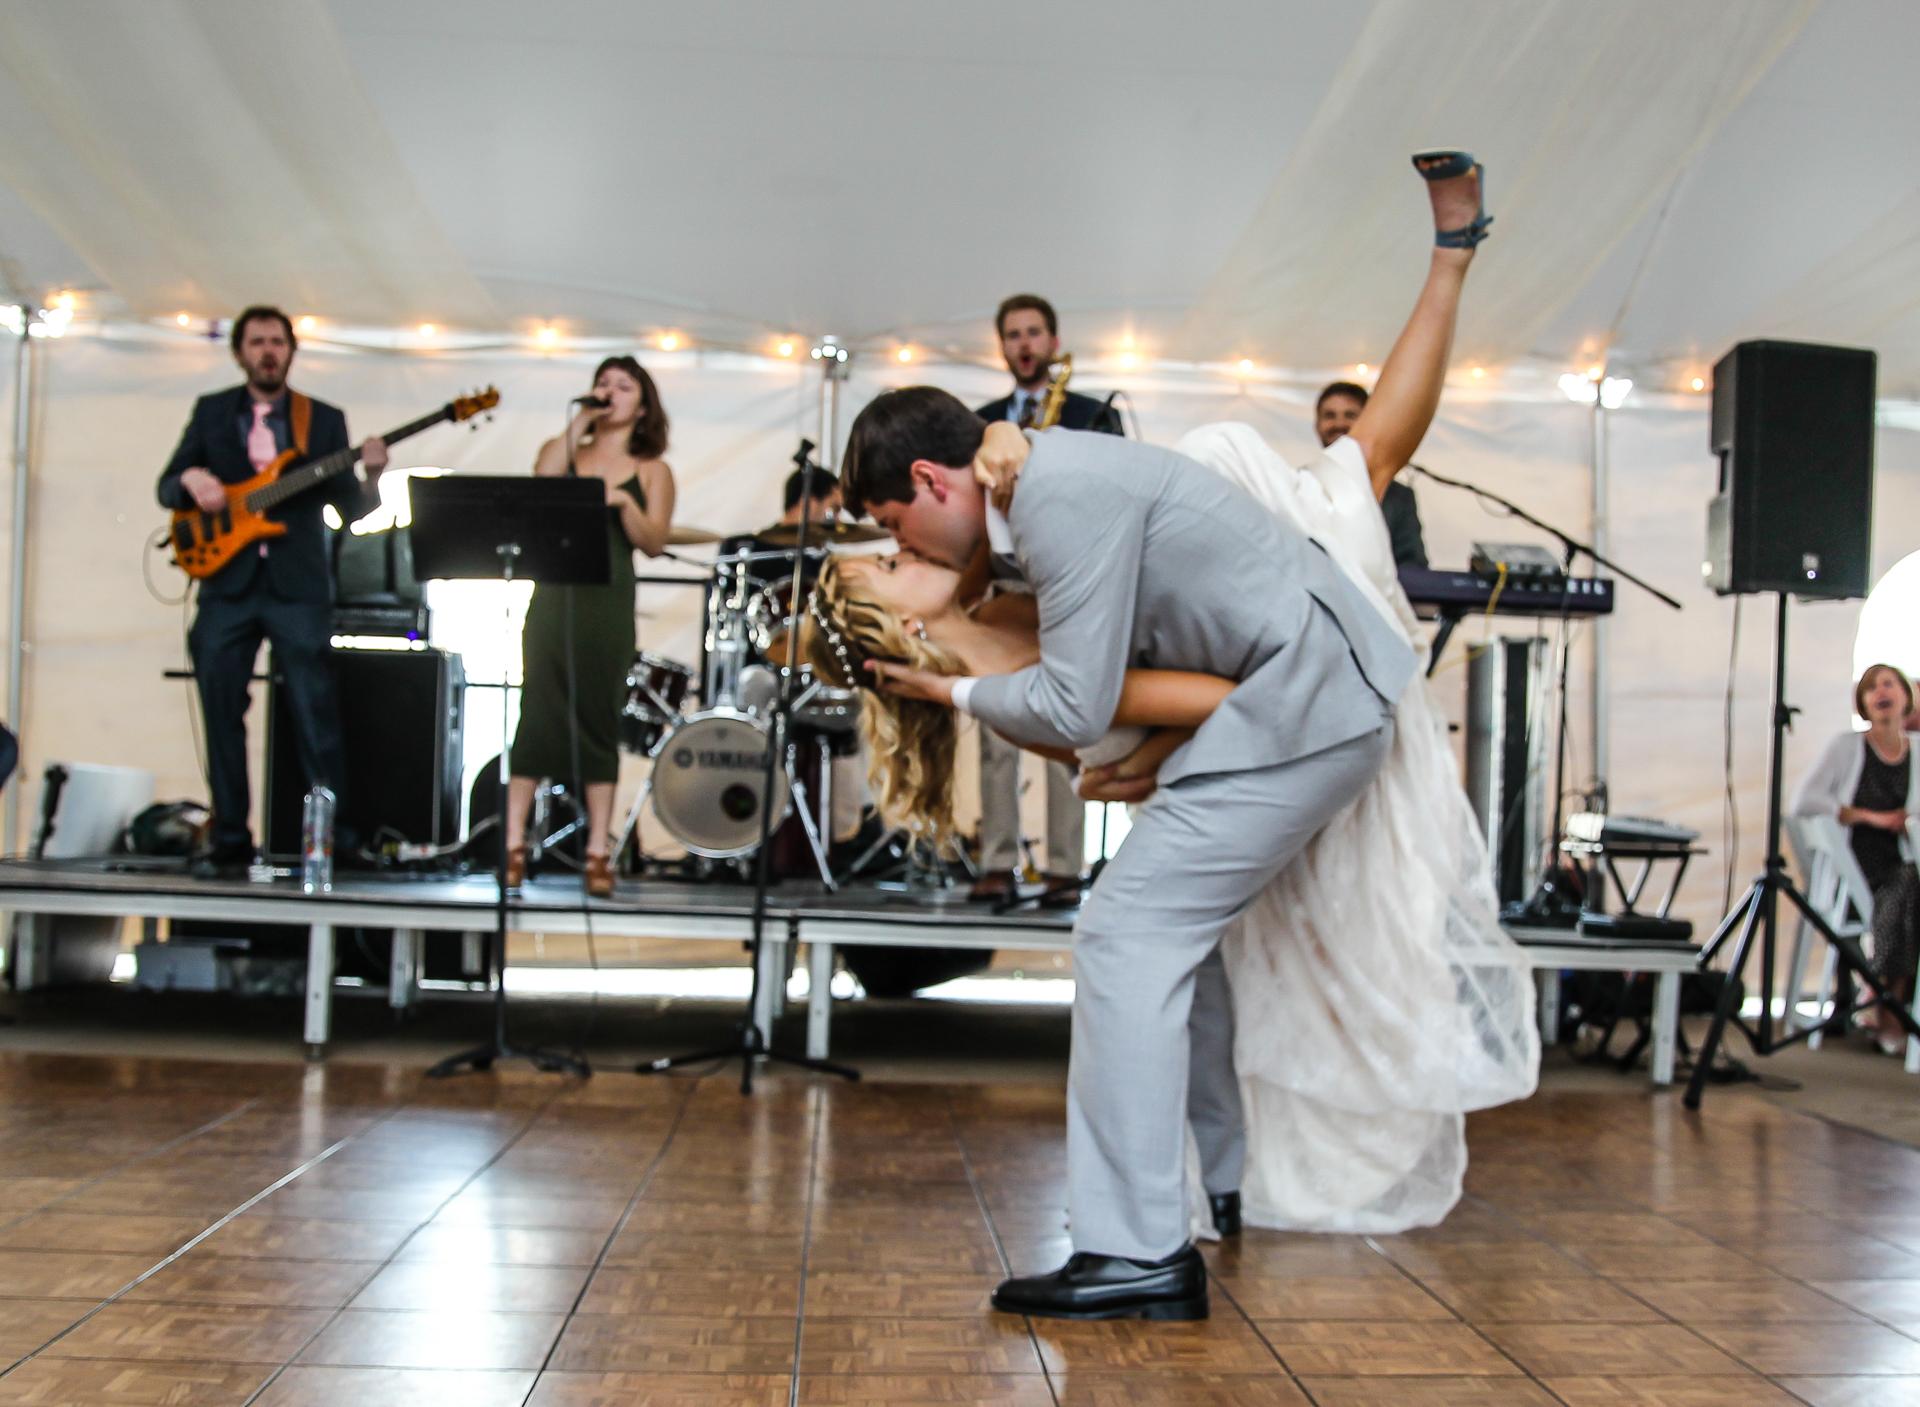 Jordan + Kevin Wedding On Sunny Slope Farm Wedding Venue by Linda Hexter Photography (23 of 30)